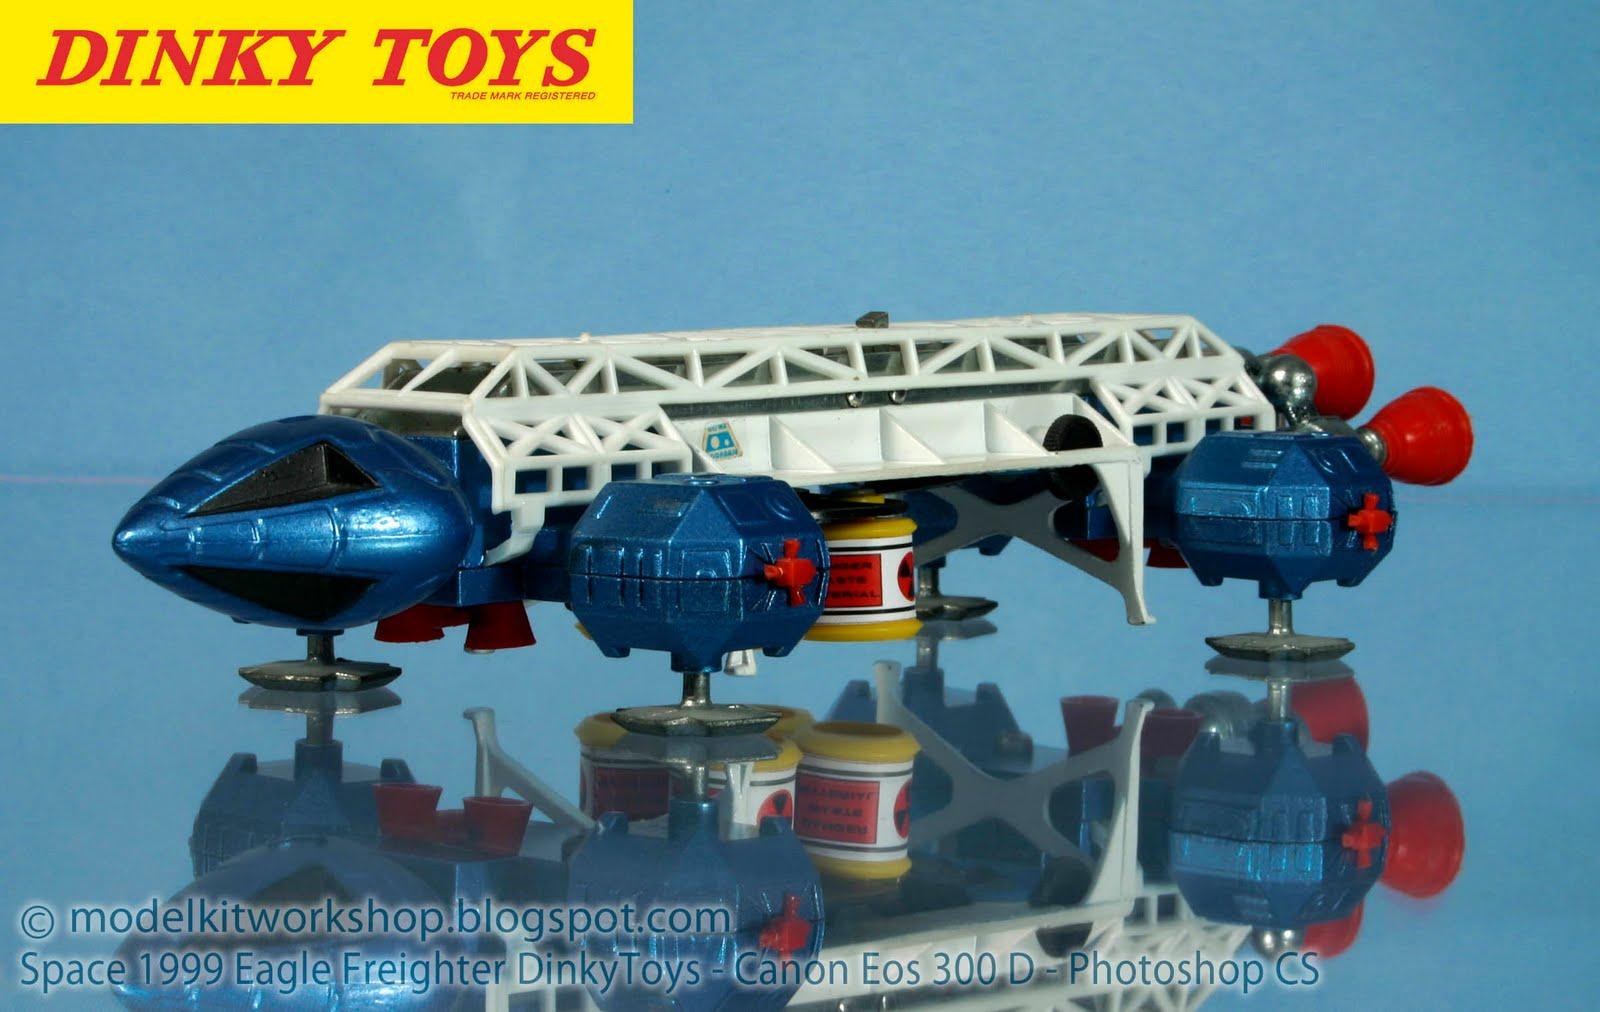 MODELKIT WORKSHOP: SPACE 1999 EAGLE : Dinky Toys